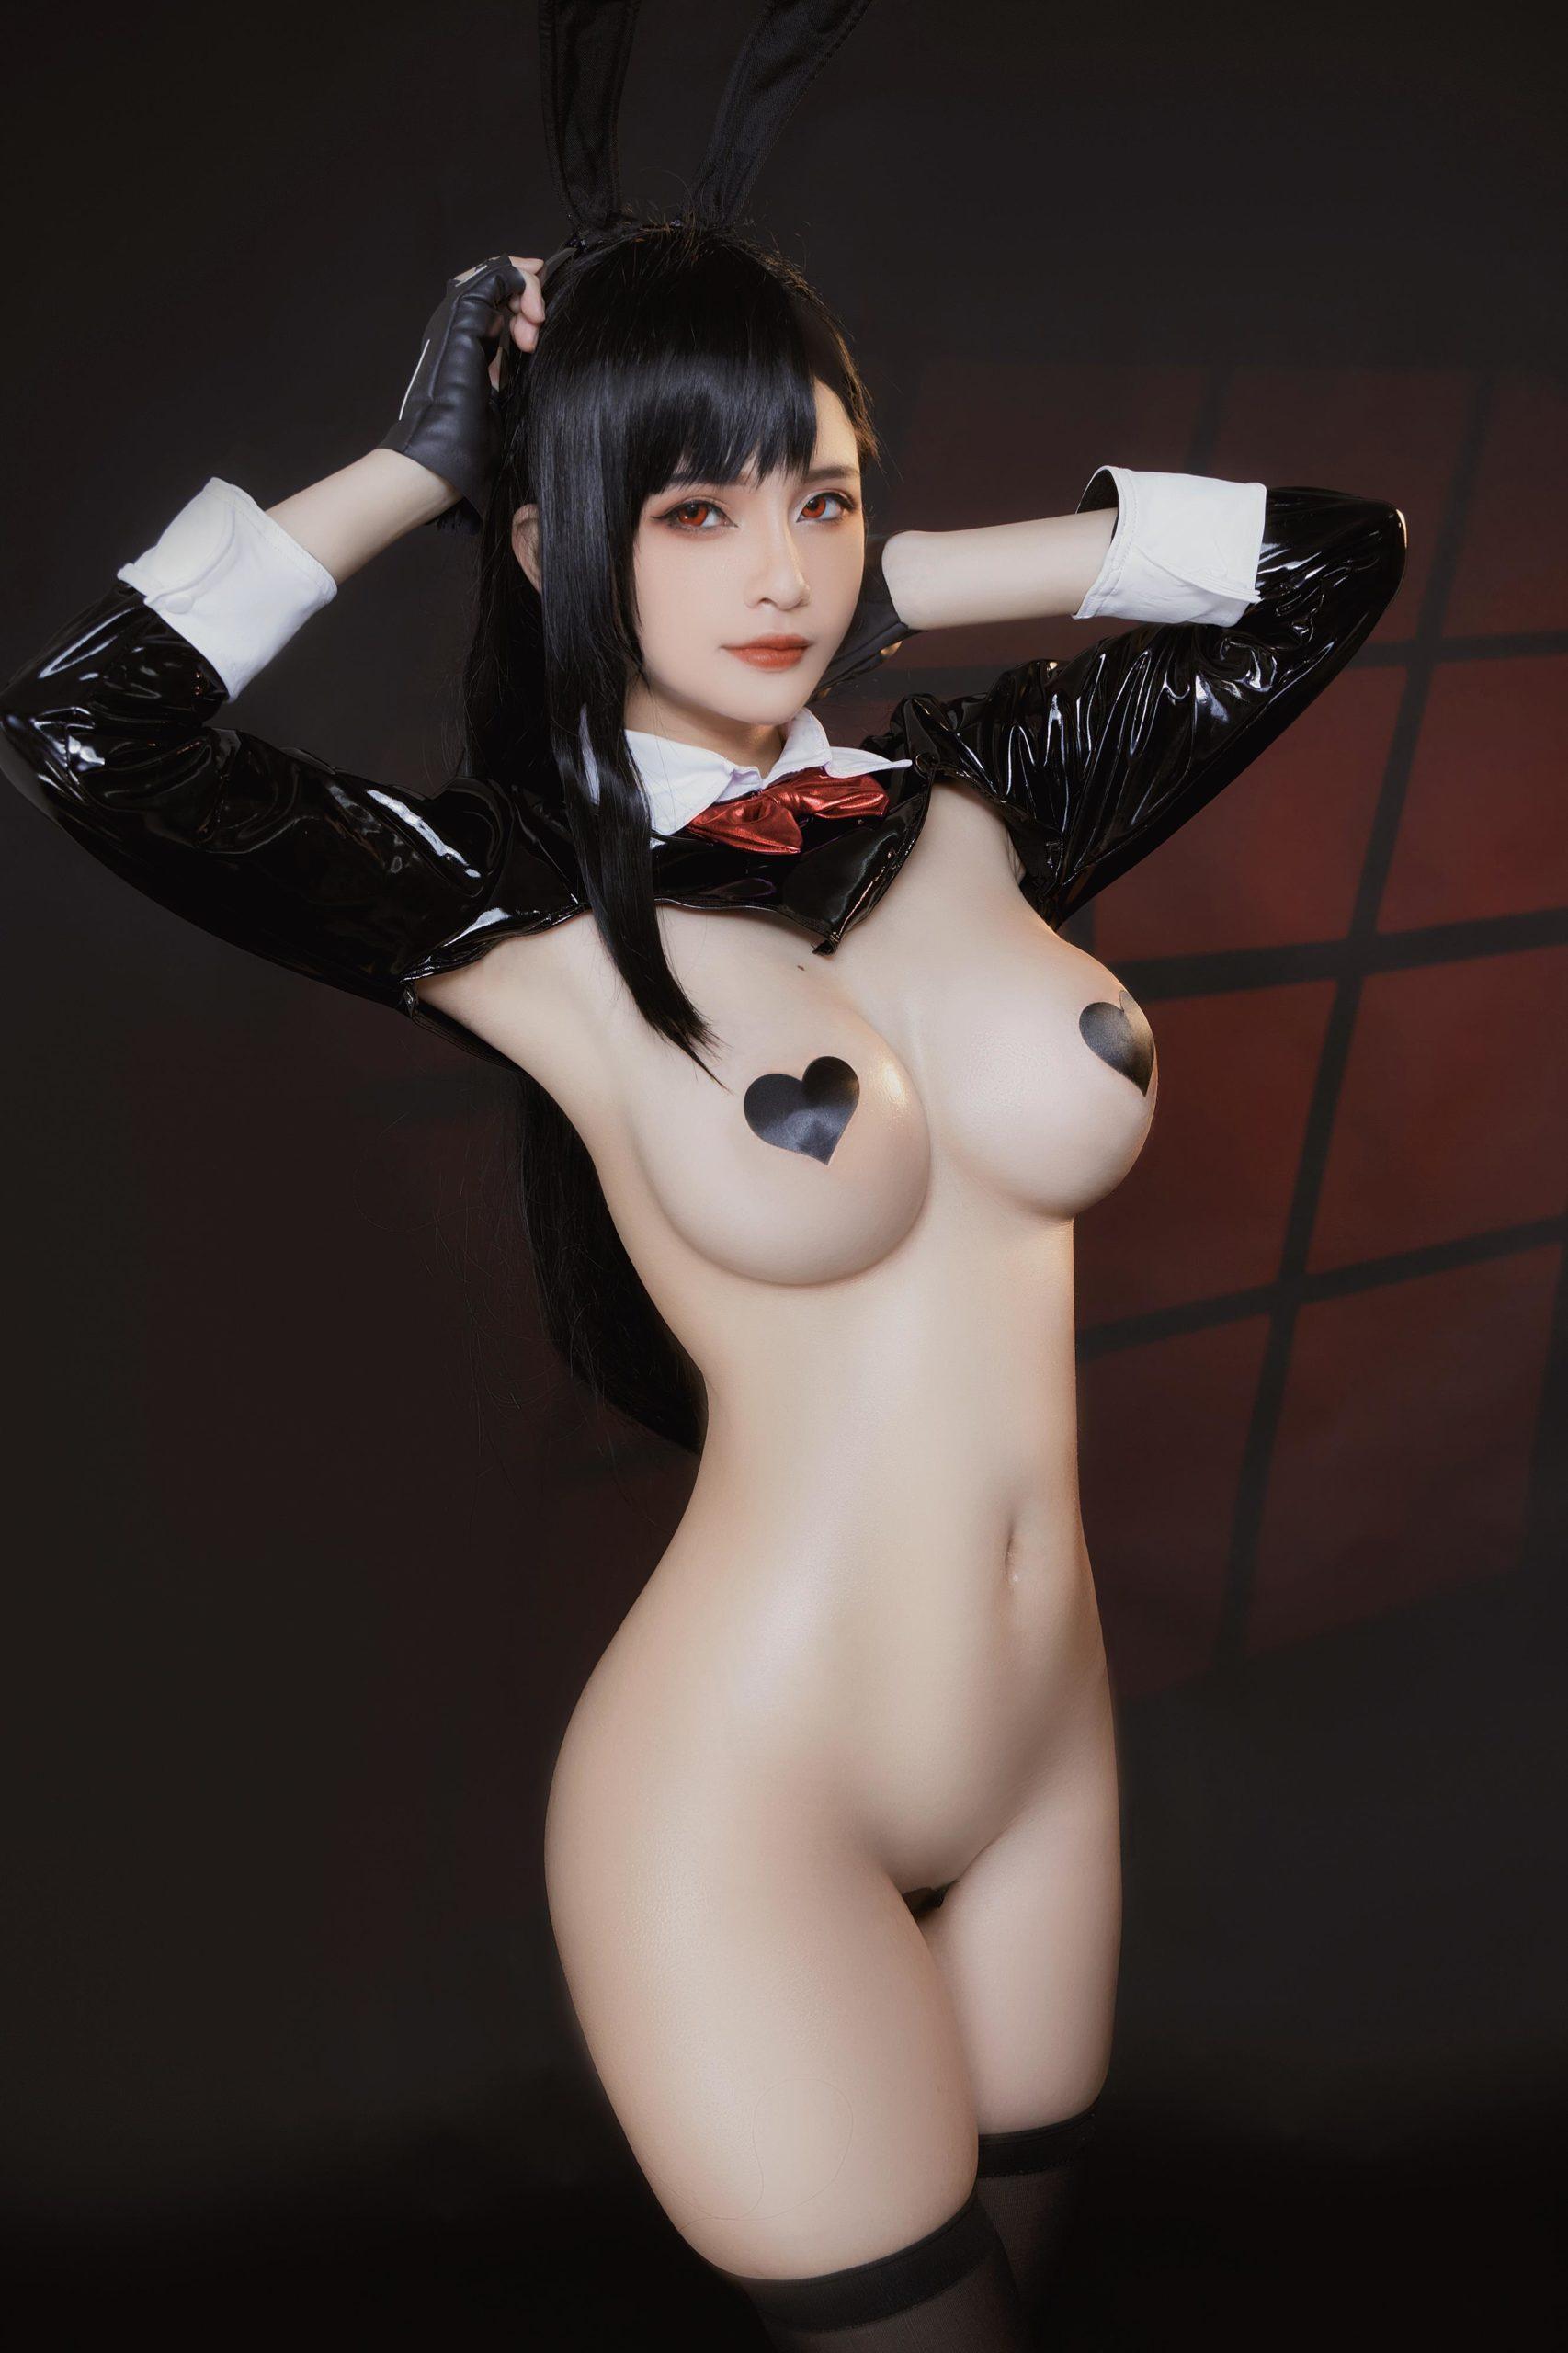 TifaLockhart Bunny Girl EroCosplay by Azami 1